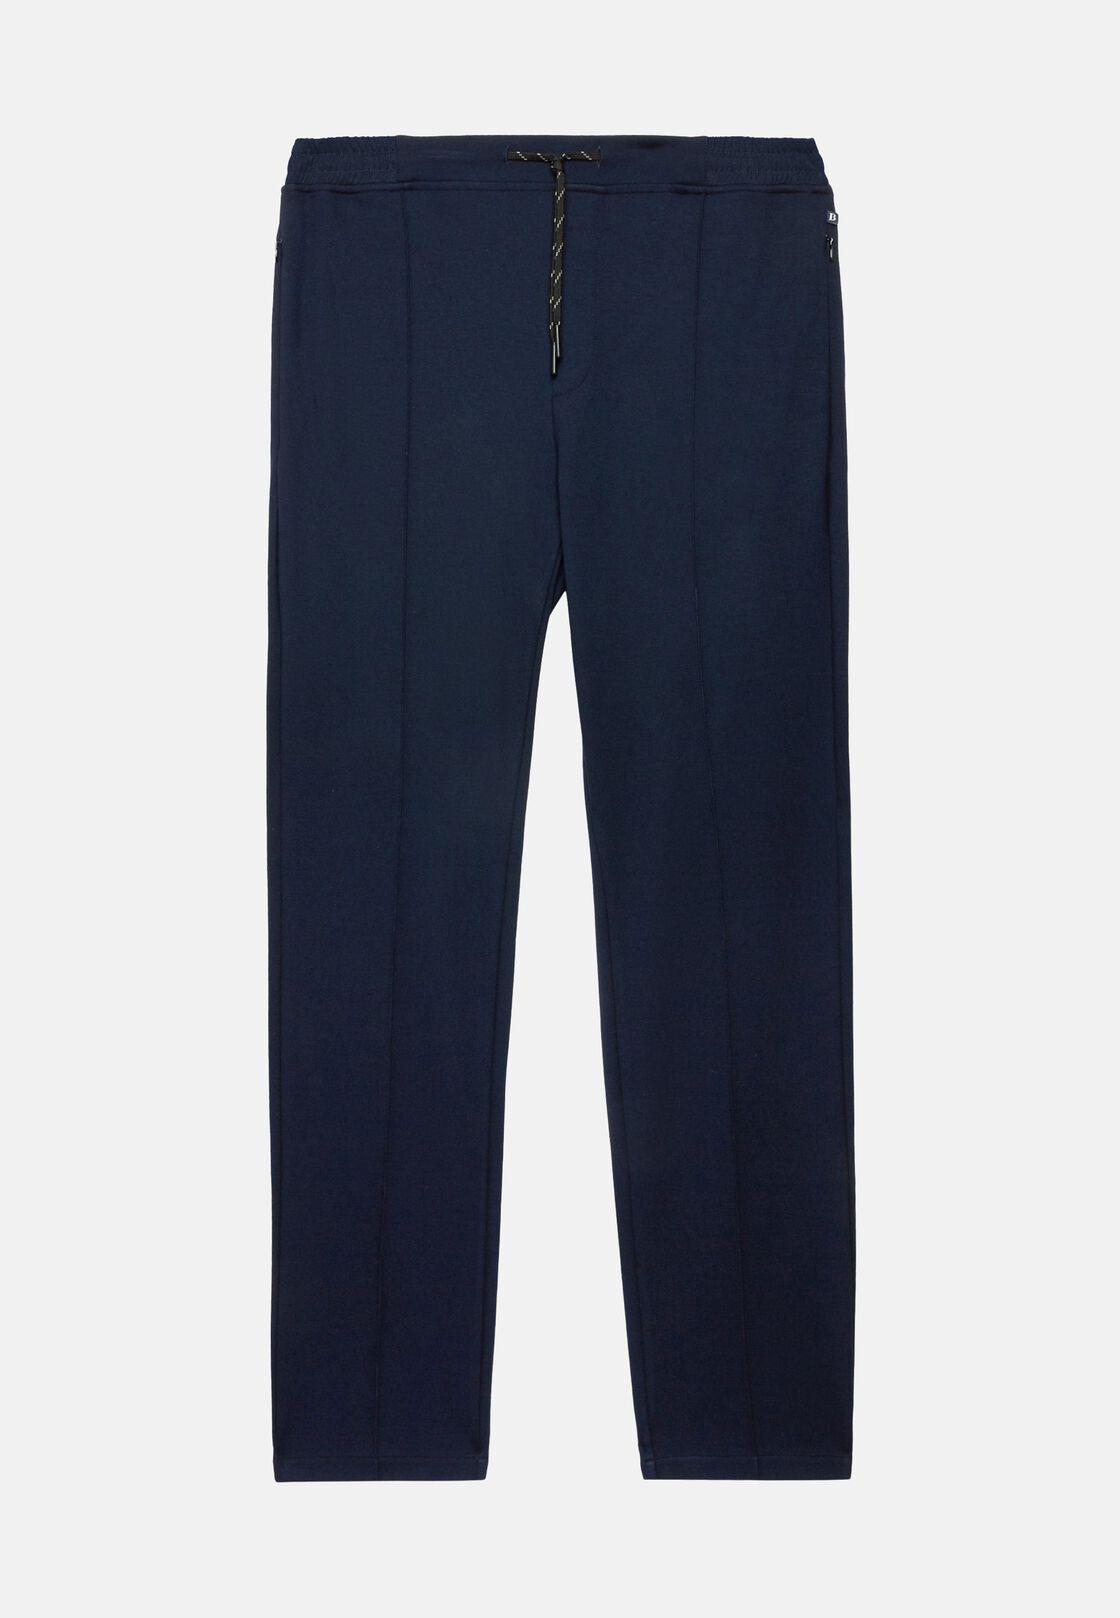 Pantaloni in interlock tecnico elasticizzato, Navy, hi-res